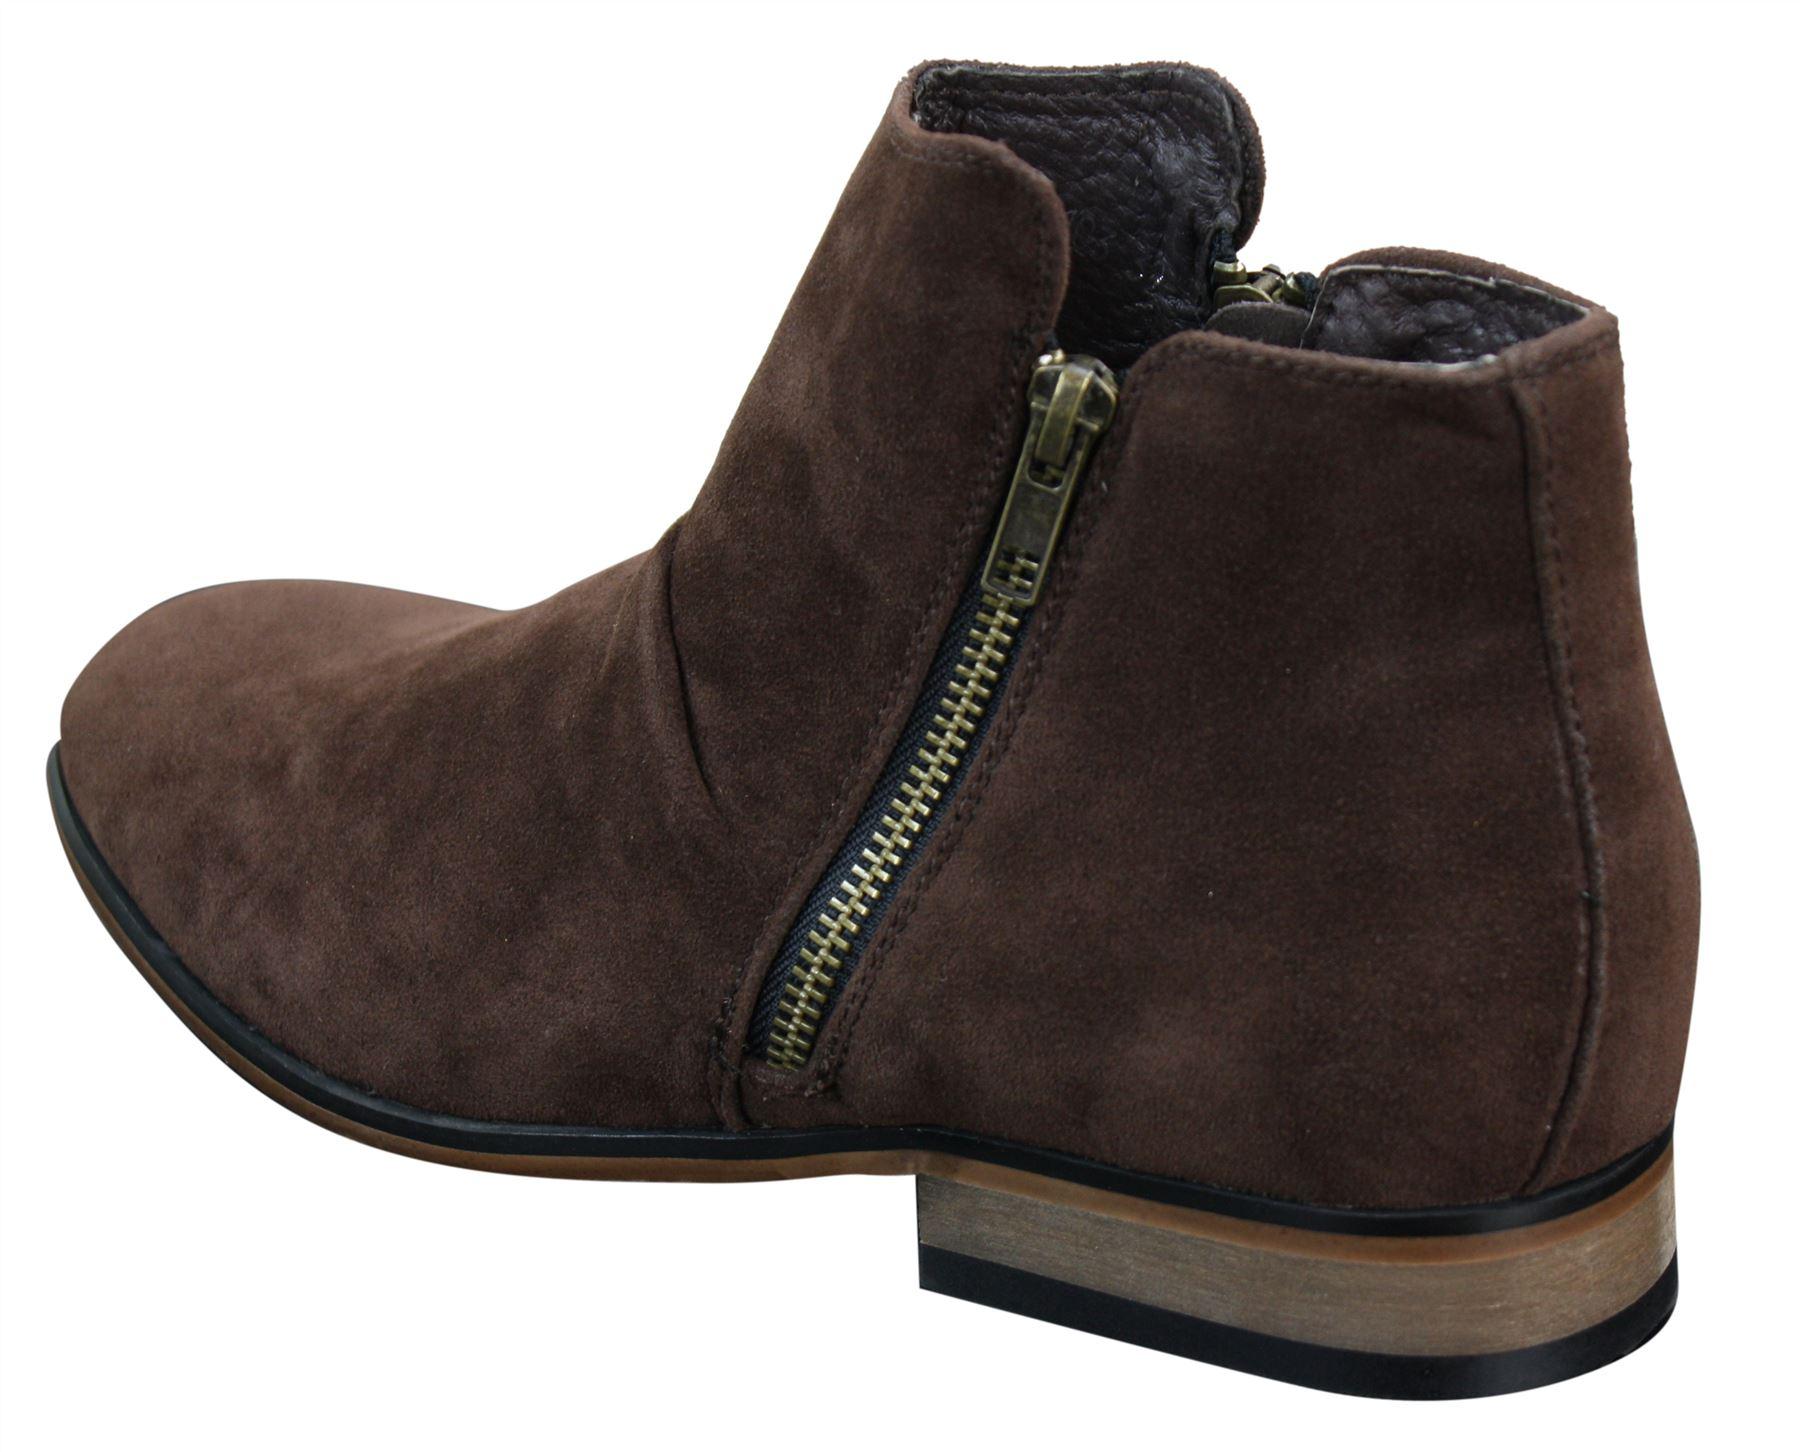 a3f76730ecc Italian suede shoes : Pompano train station